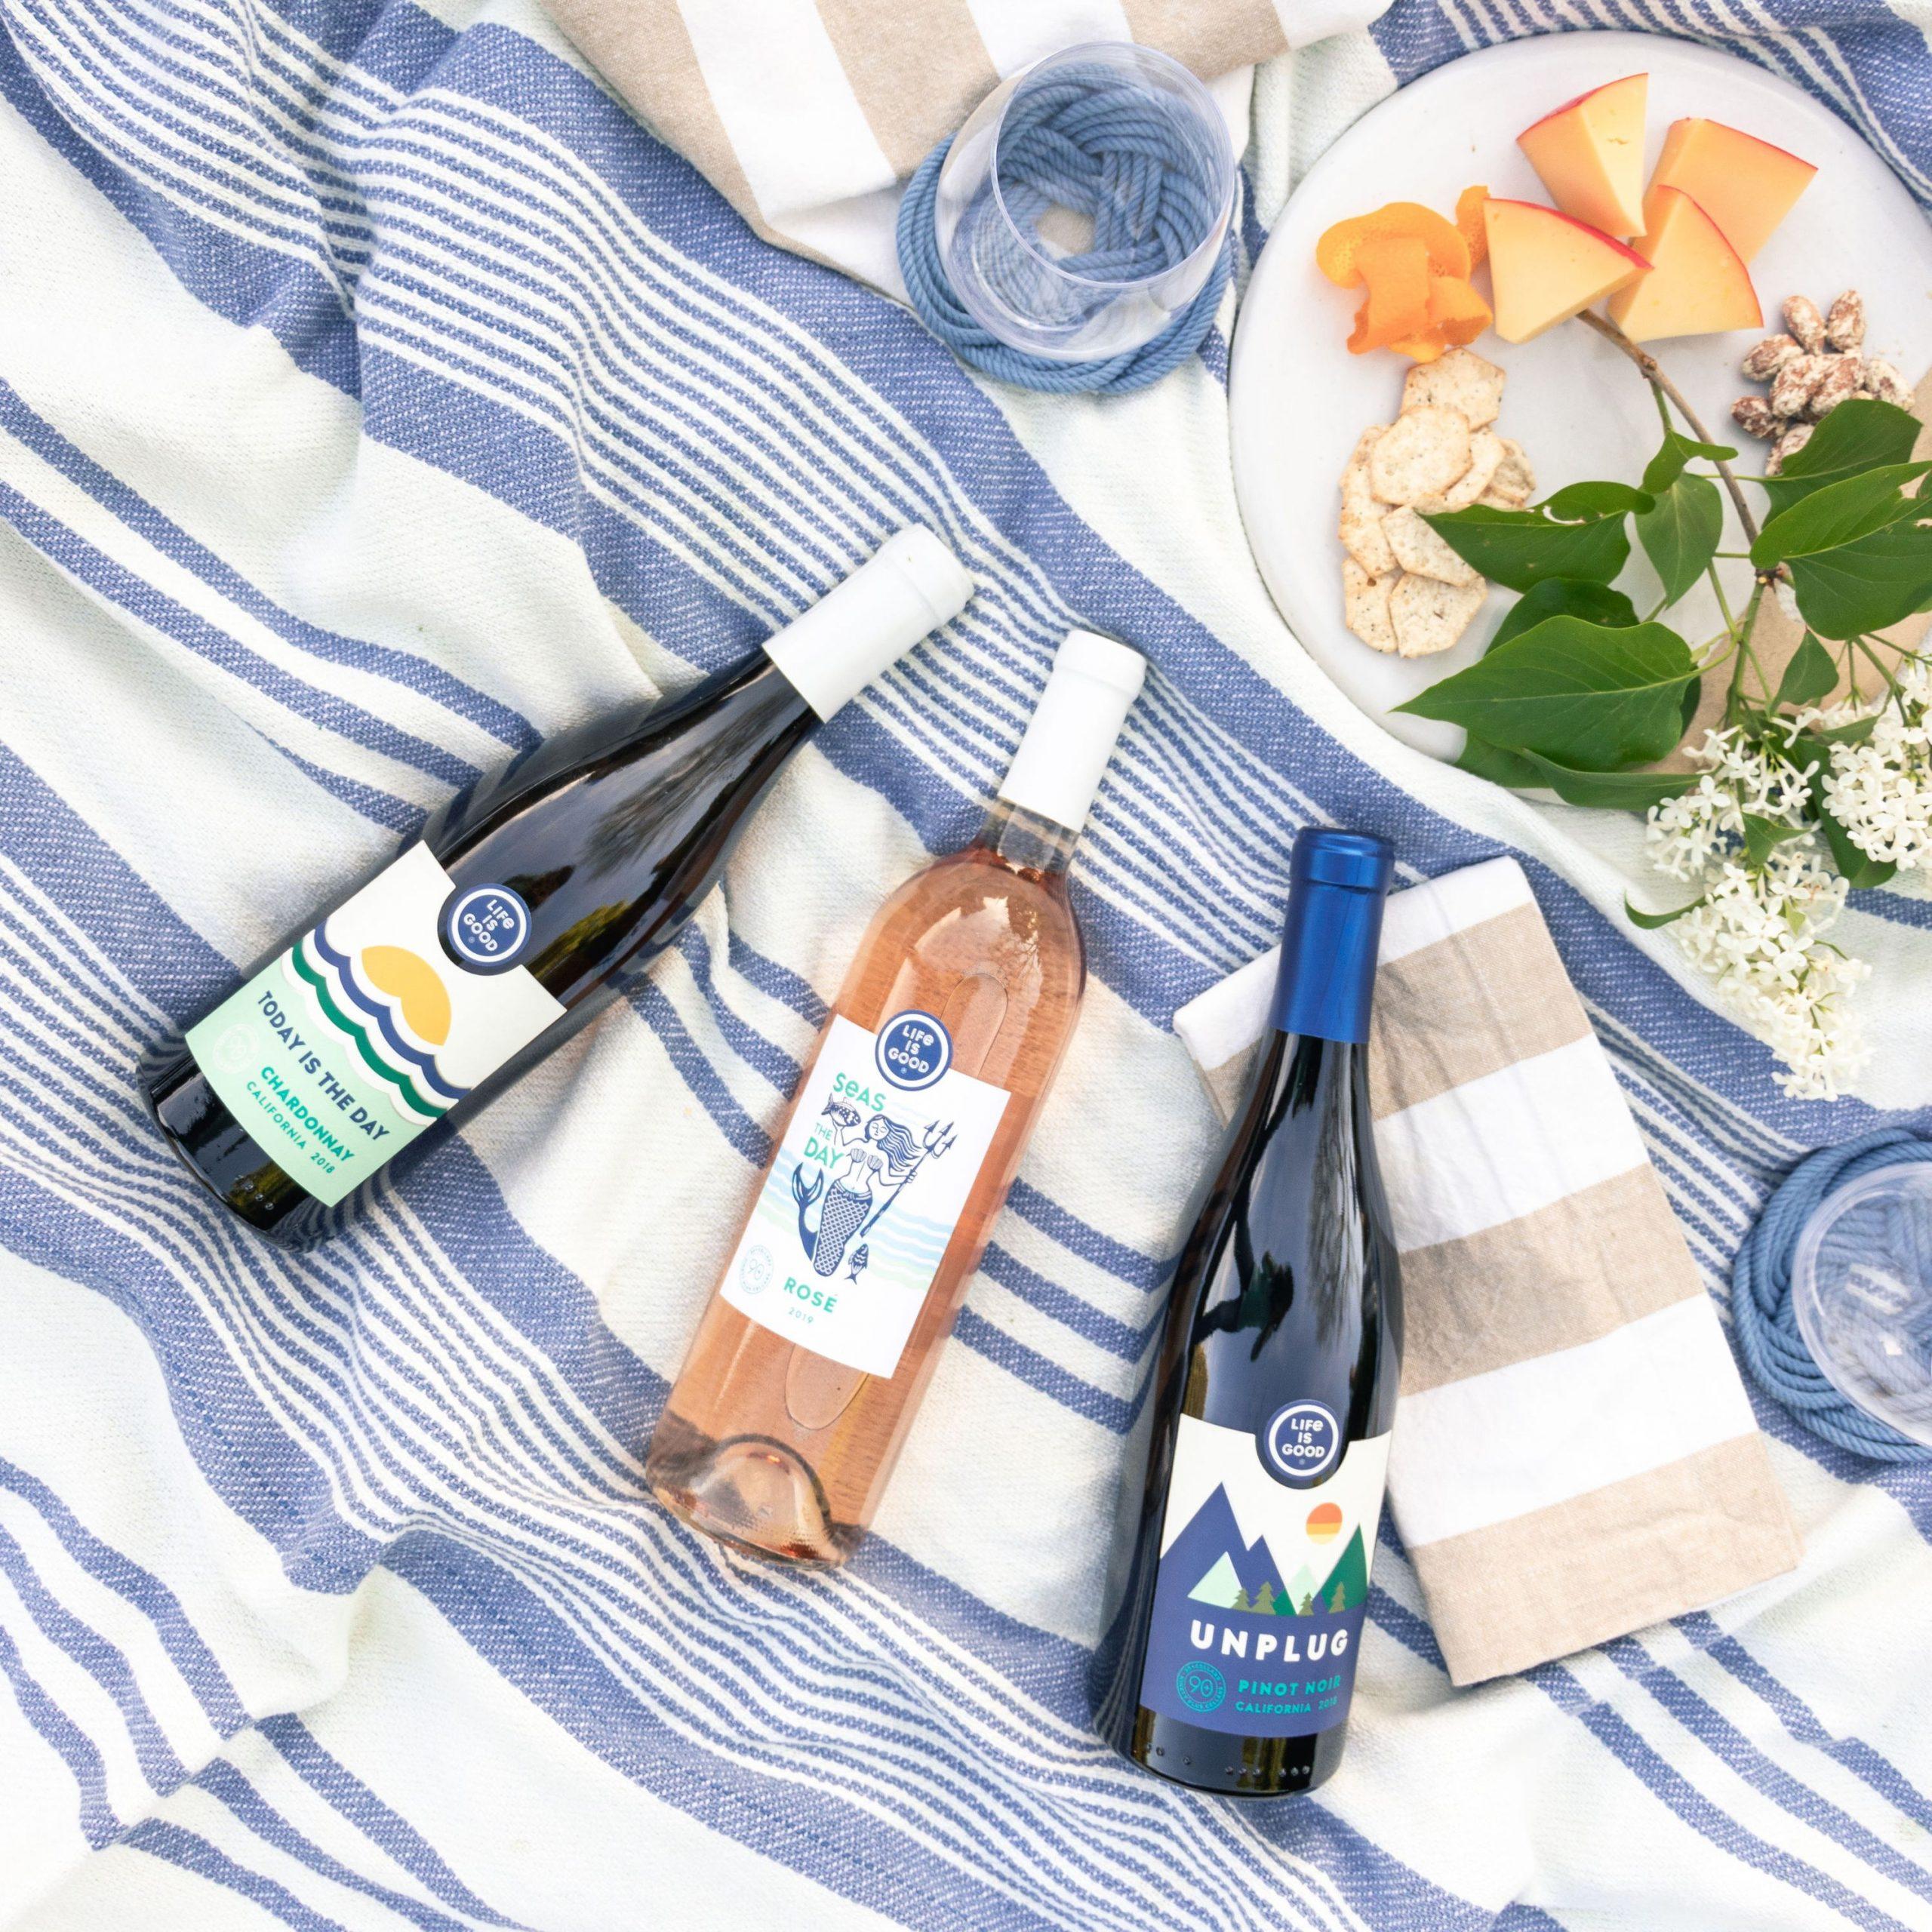 Life is Good wine varieties